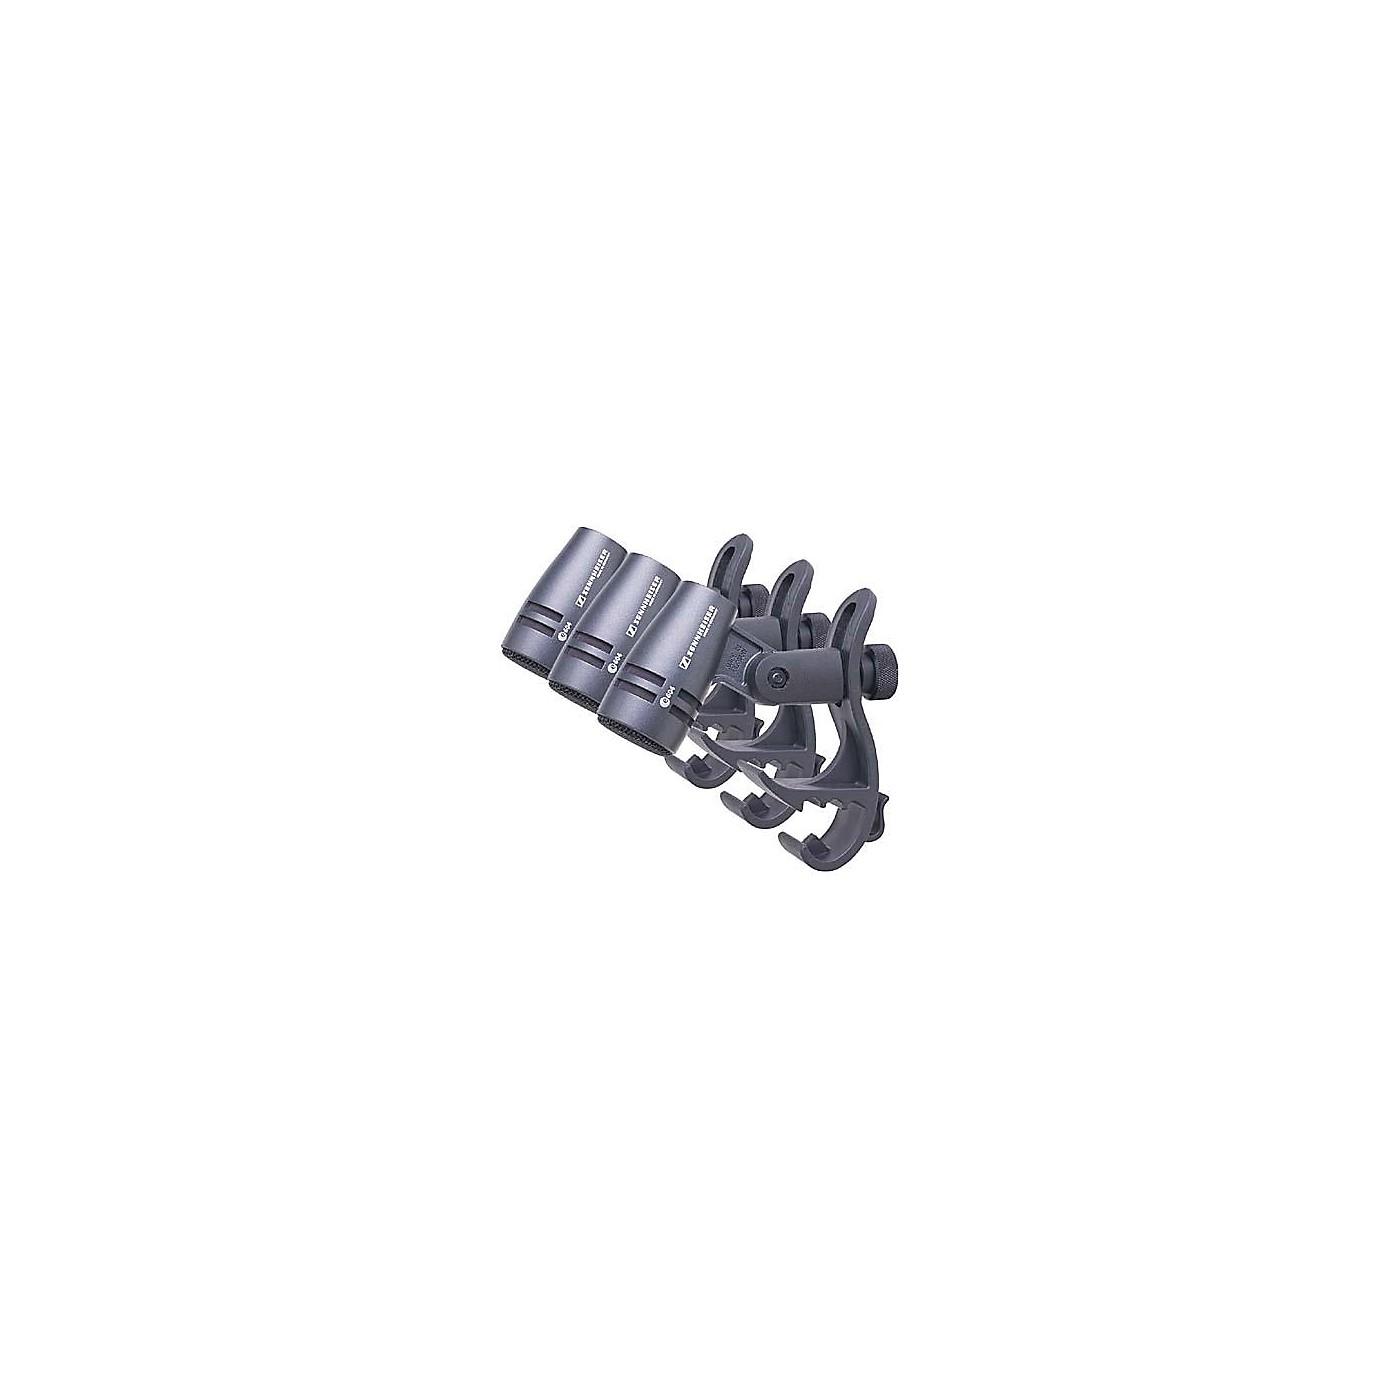 Sennheiser e 604 Dynamic Cardioid Instrument Microphone 3-Pack thumbnail